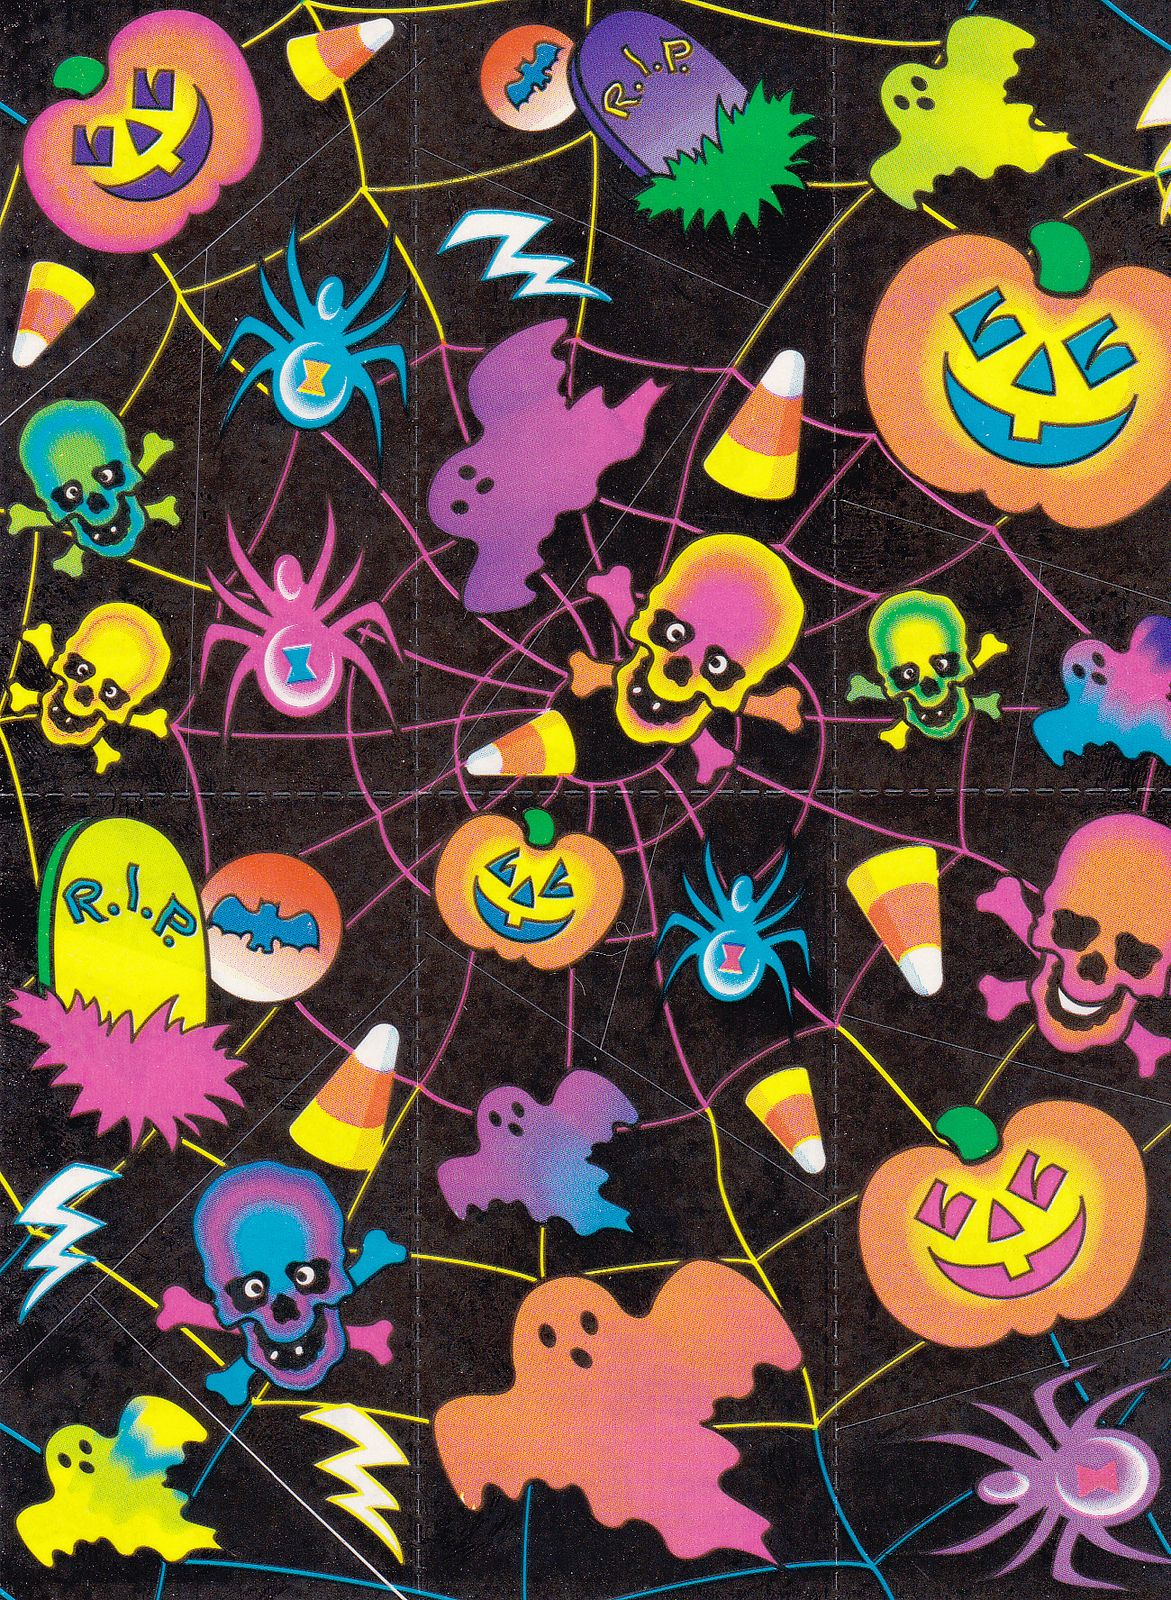 Lisa Frank Halloween Halloween Wallpaper Halloween Wallpaper Backgrounds Lisa Frank Stickers